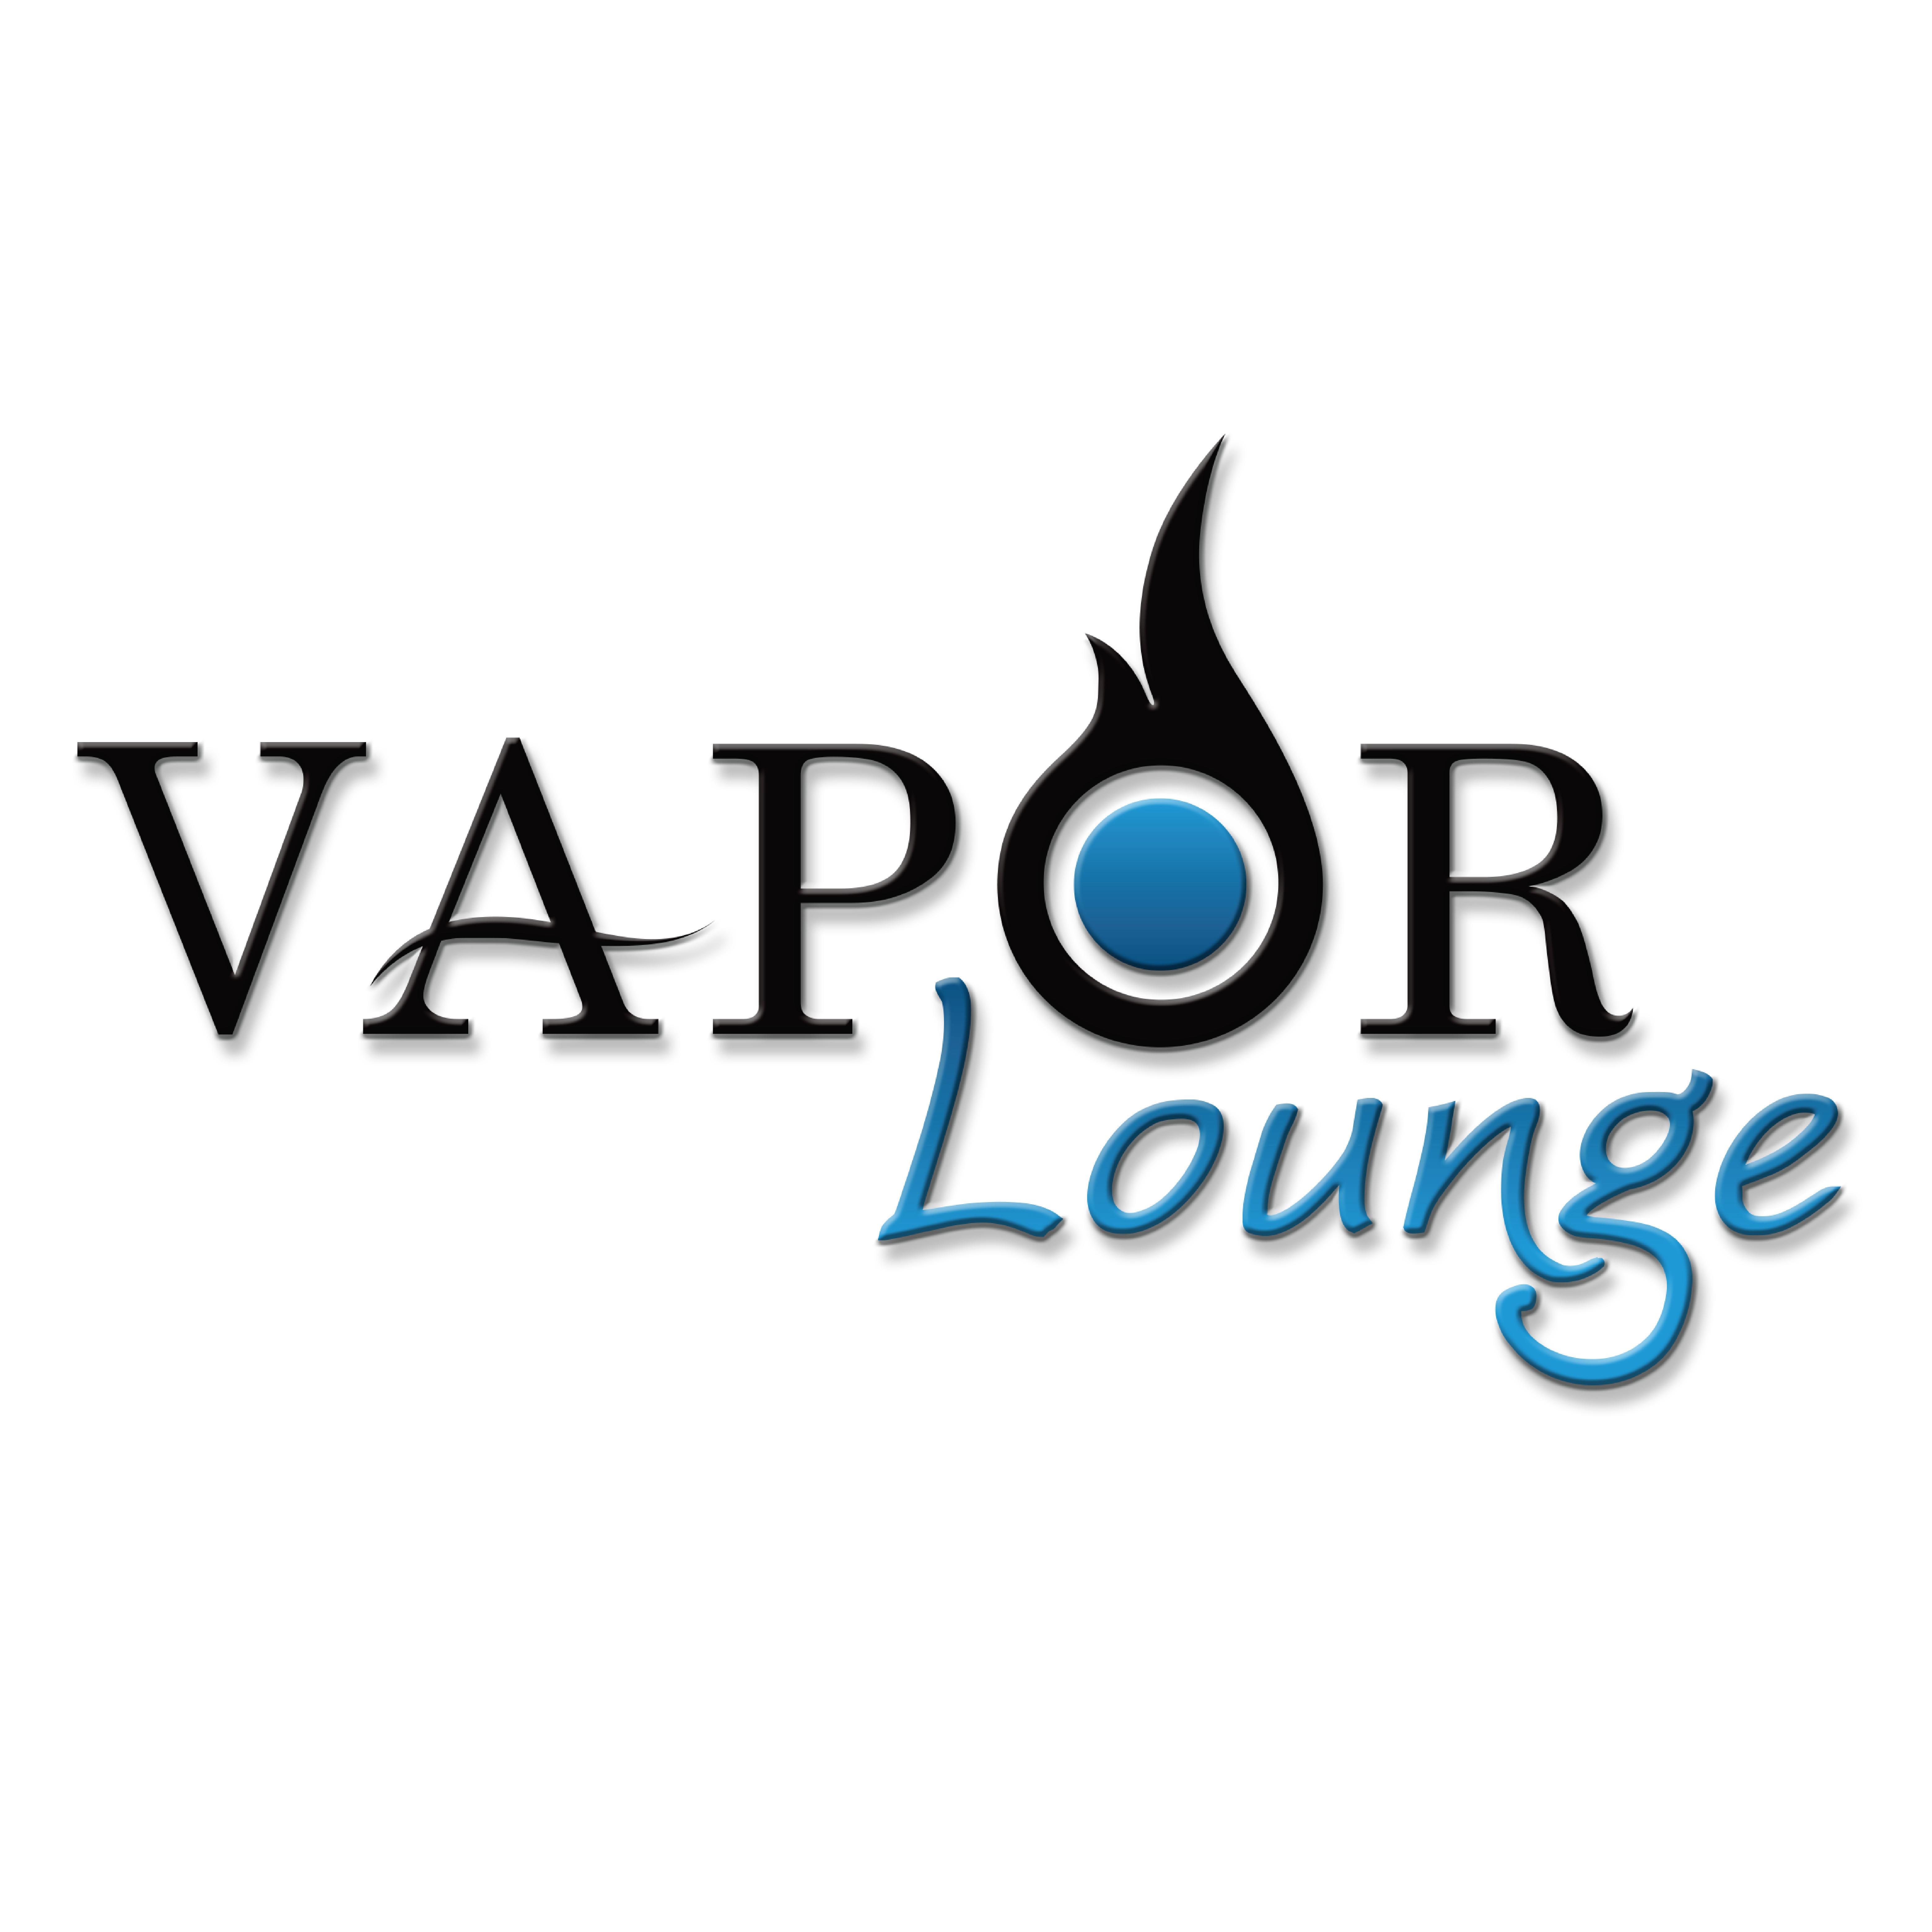 Vapor Lounge - Town Square